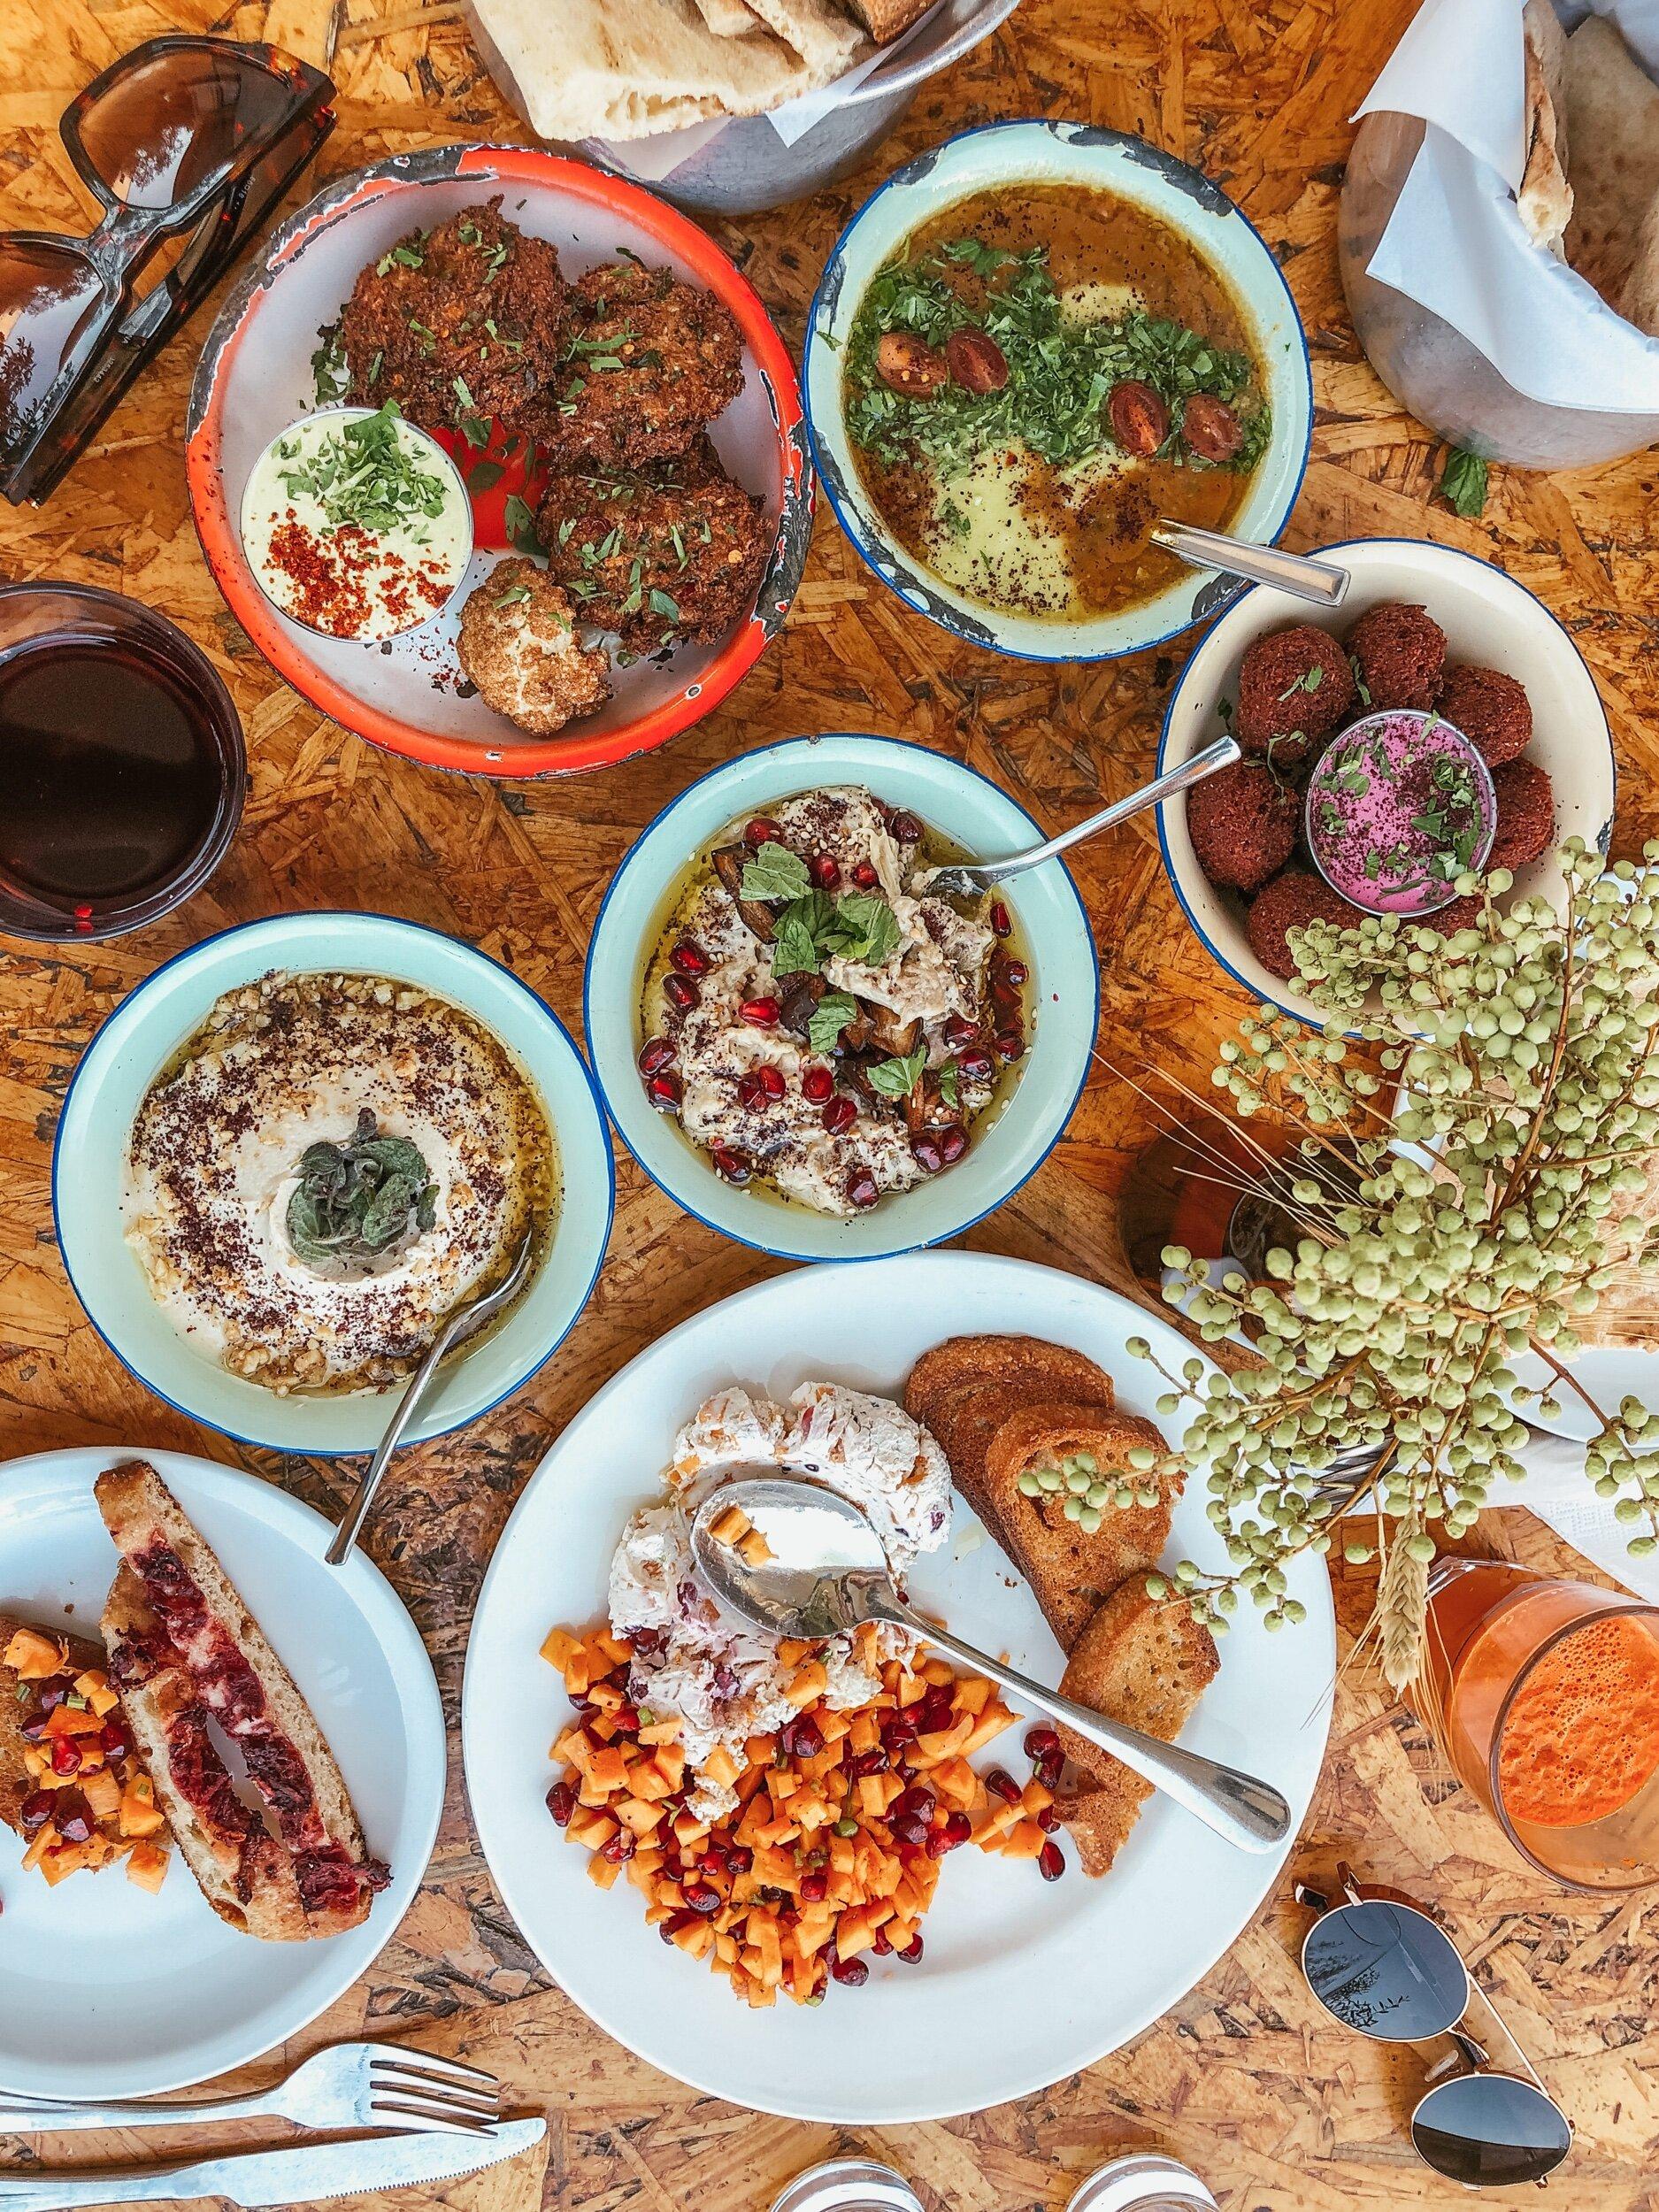 Amazing food at Shams Al Balad.